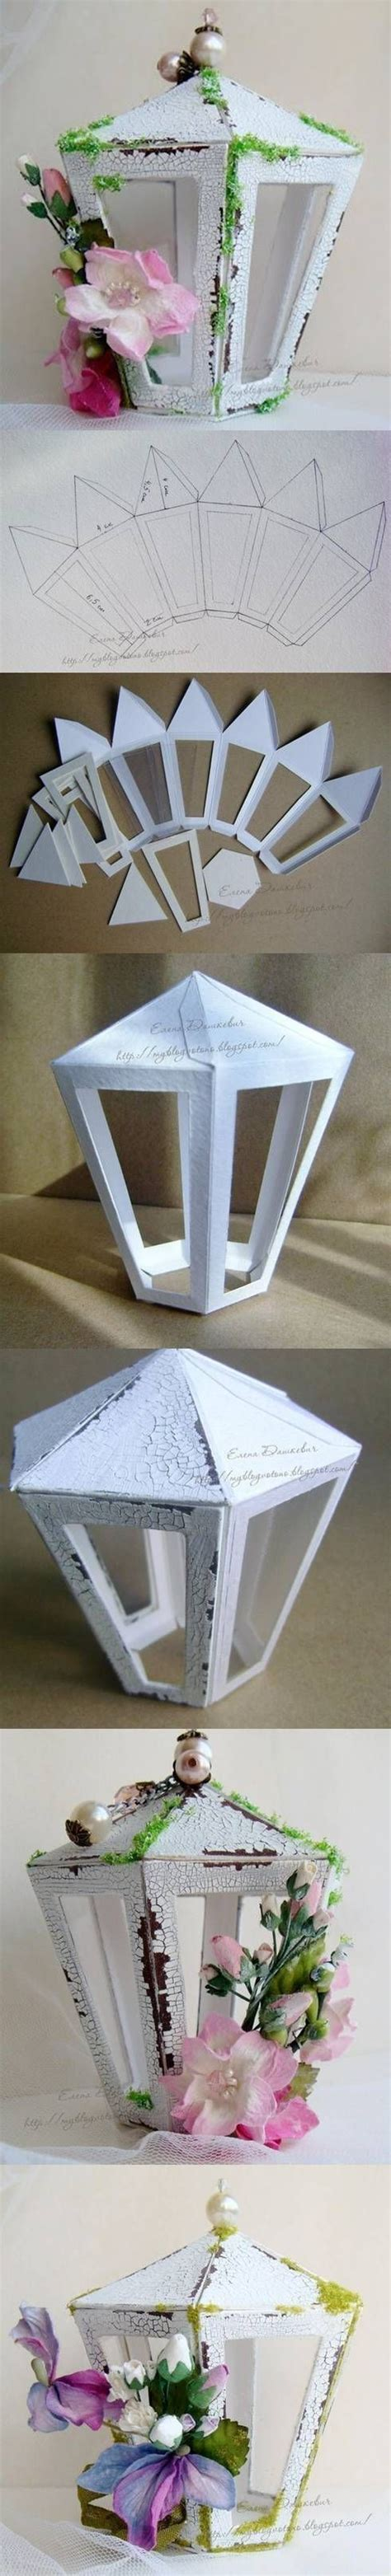 paper lantern craft template diy cardboard lantern template diy projects usefuldiy